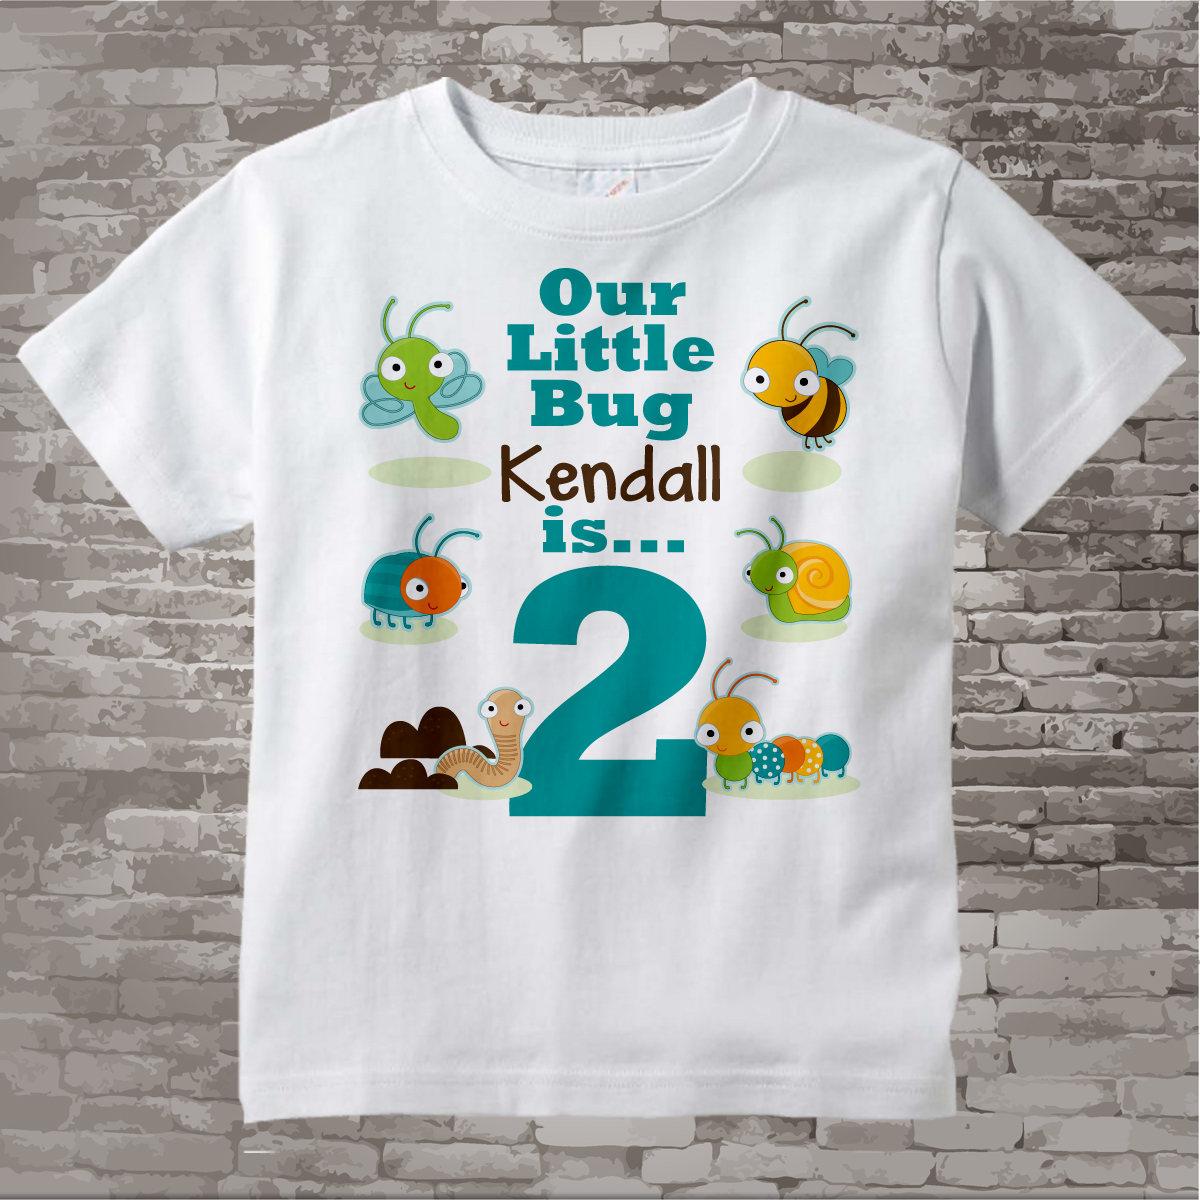 2nd Birthday Shirt Personalized Bug Theme 05032017e Gallery Photo